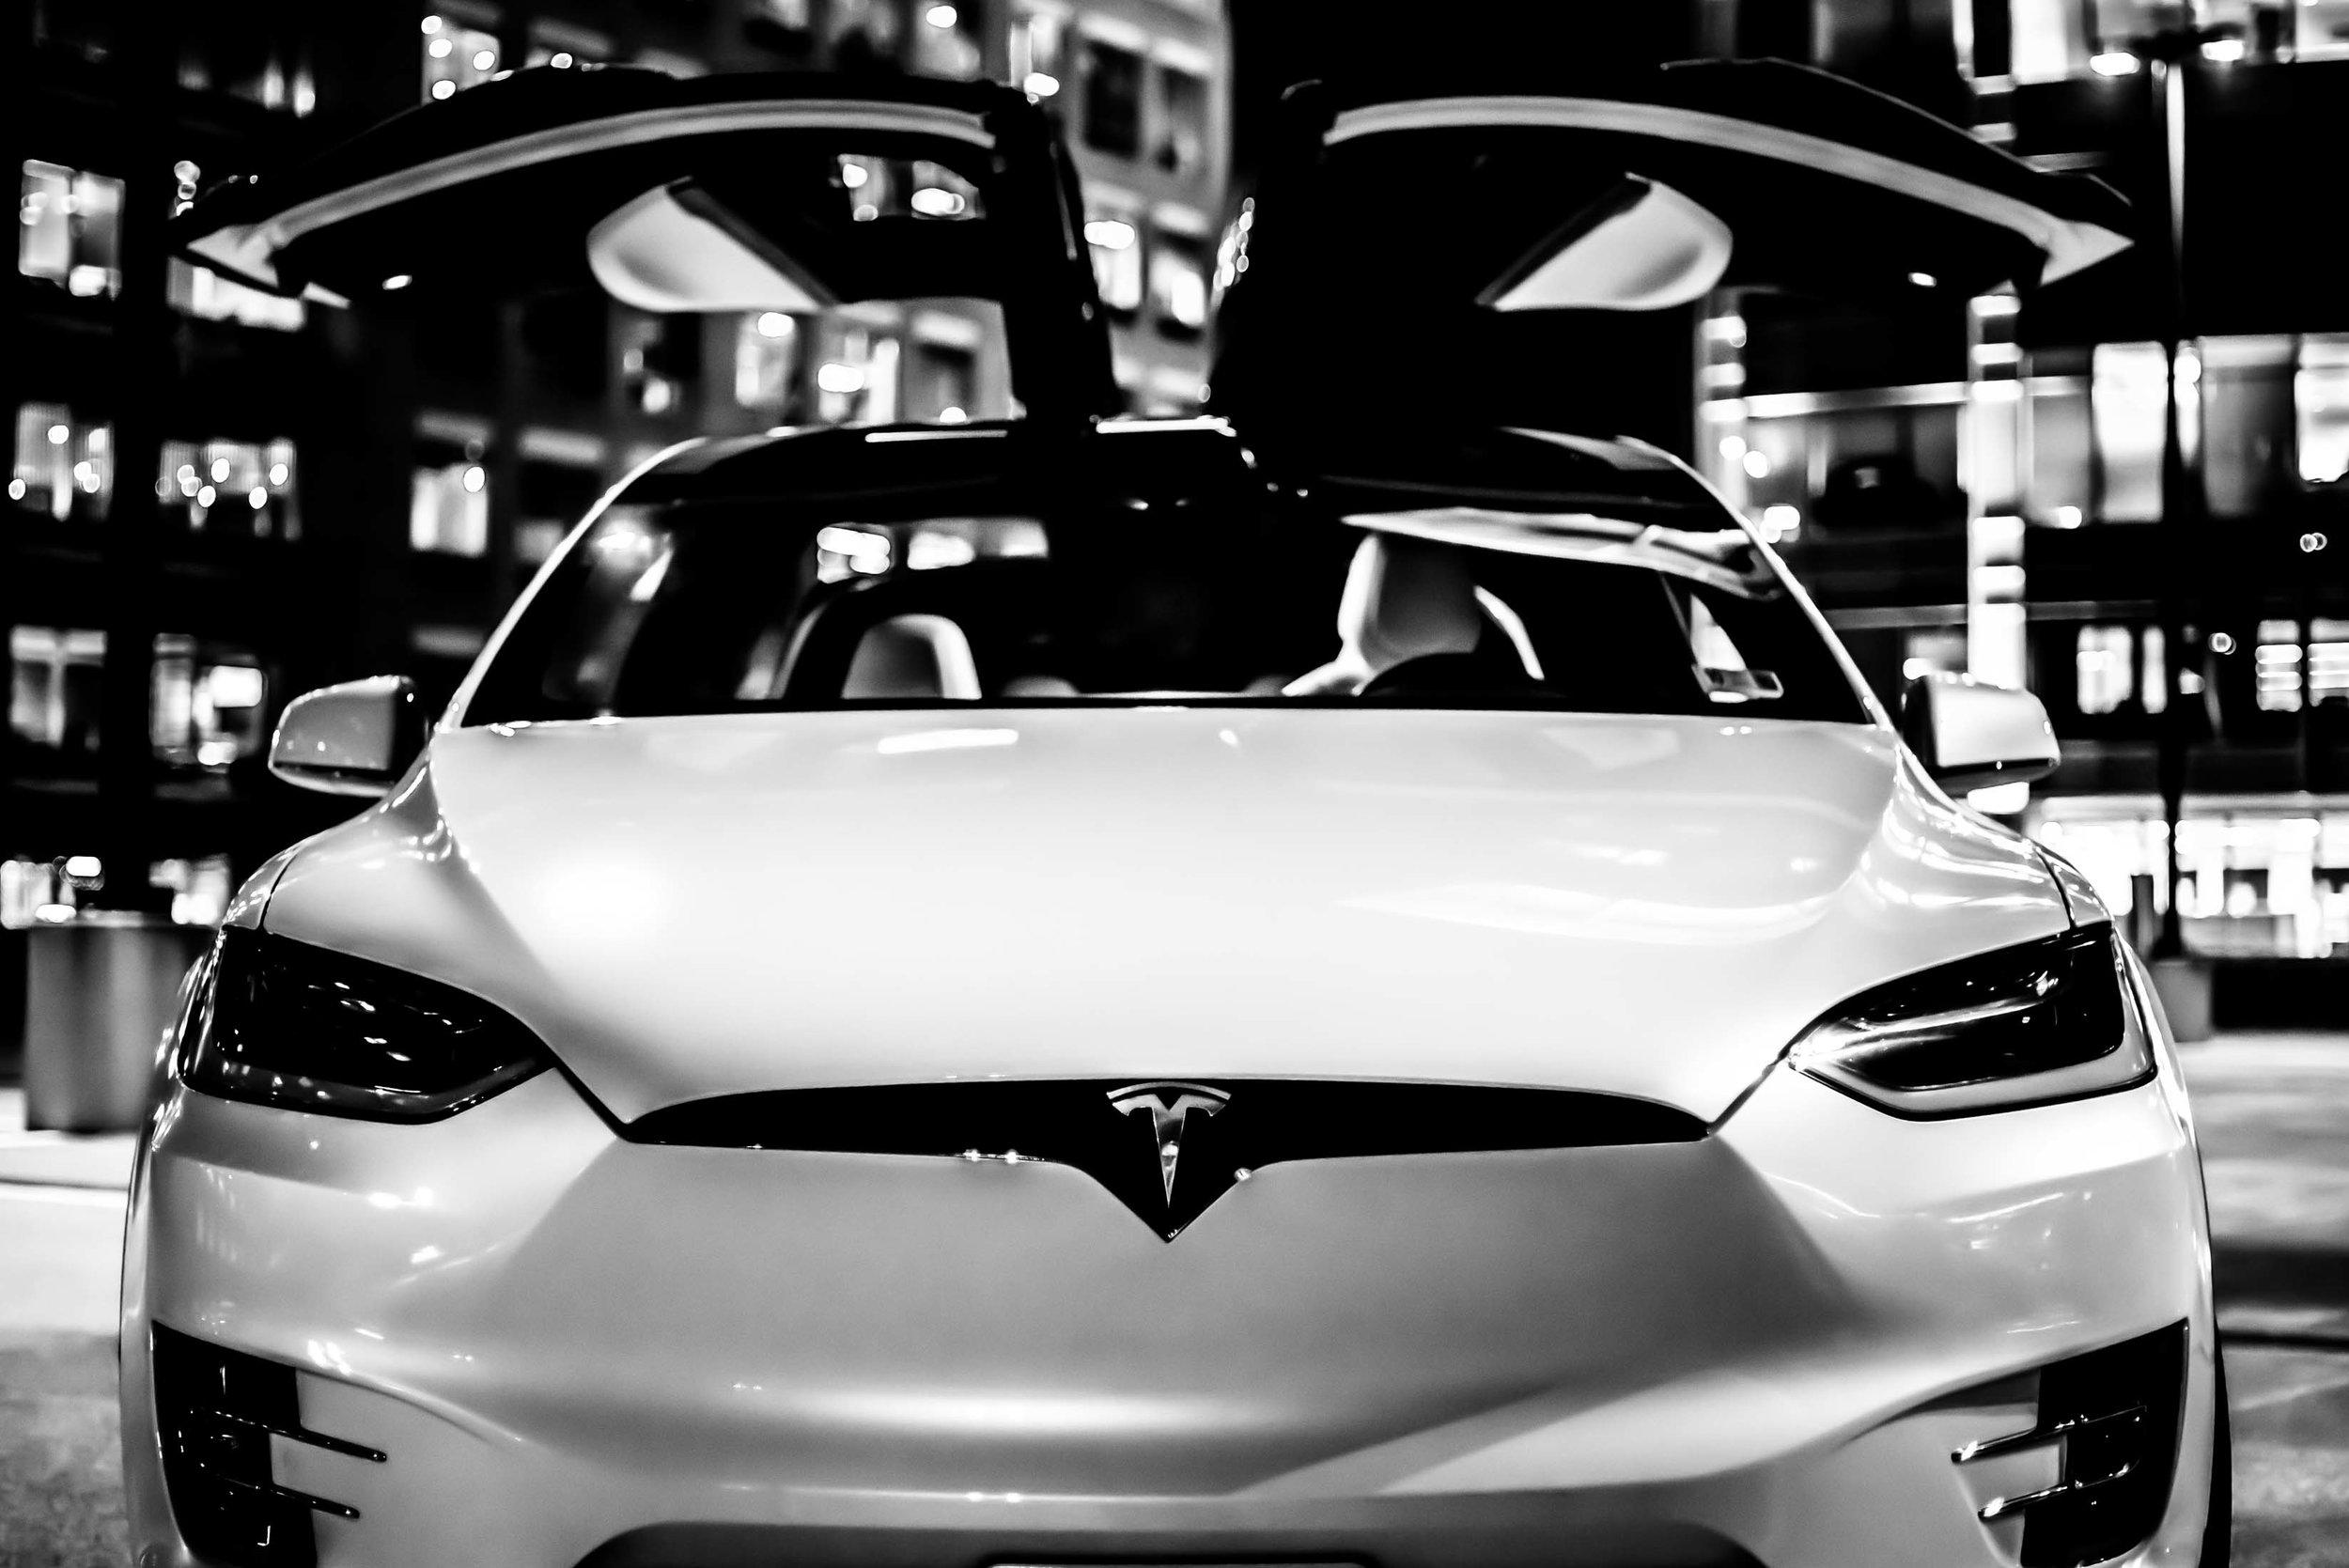 fleet+vehicle+sexy+car+photo+video+speed+tesla+p100d+vadym+guliuk+photography-6.jpg